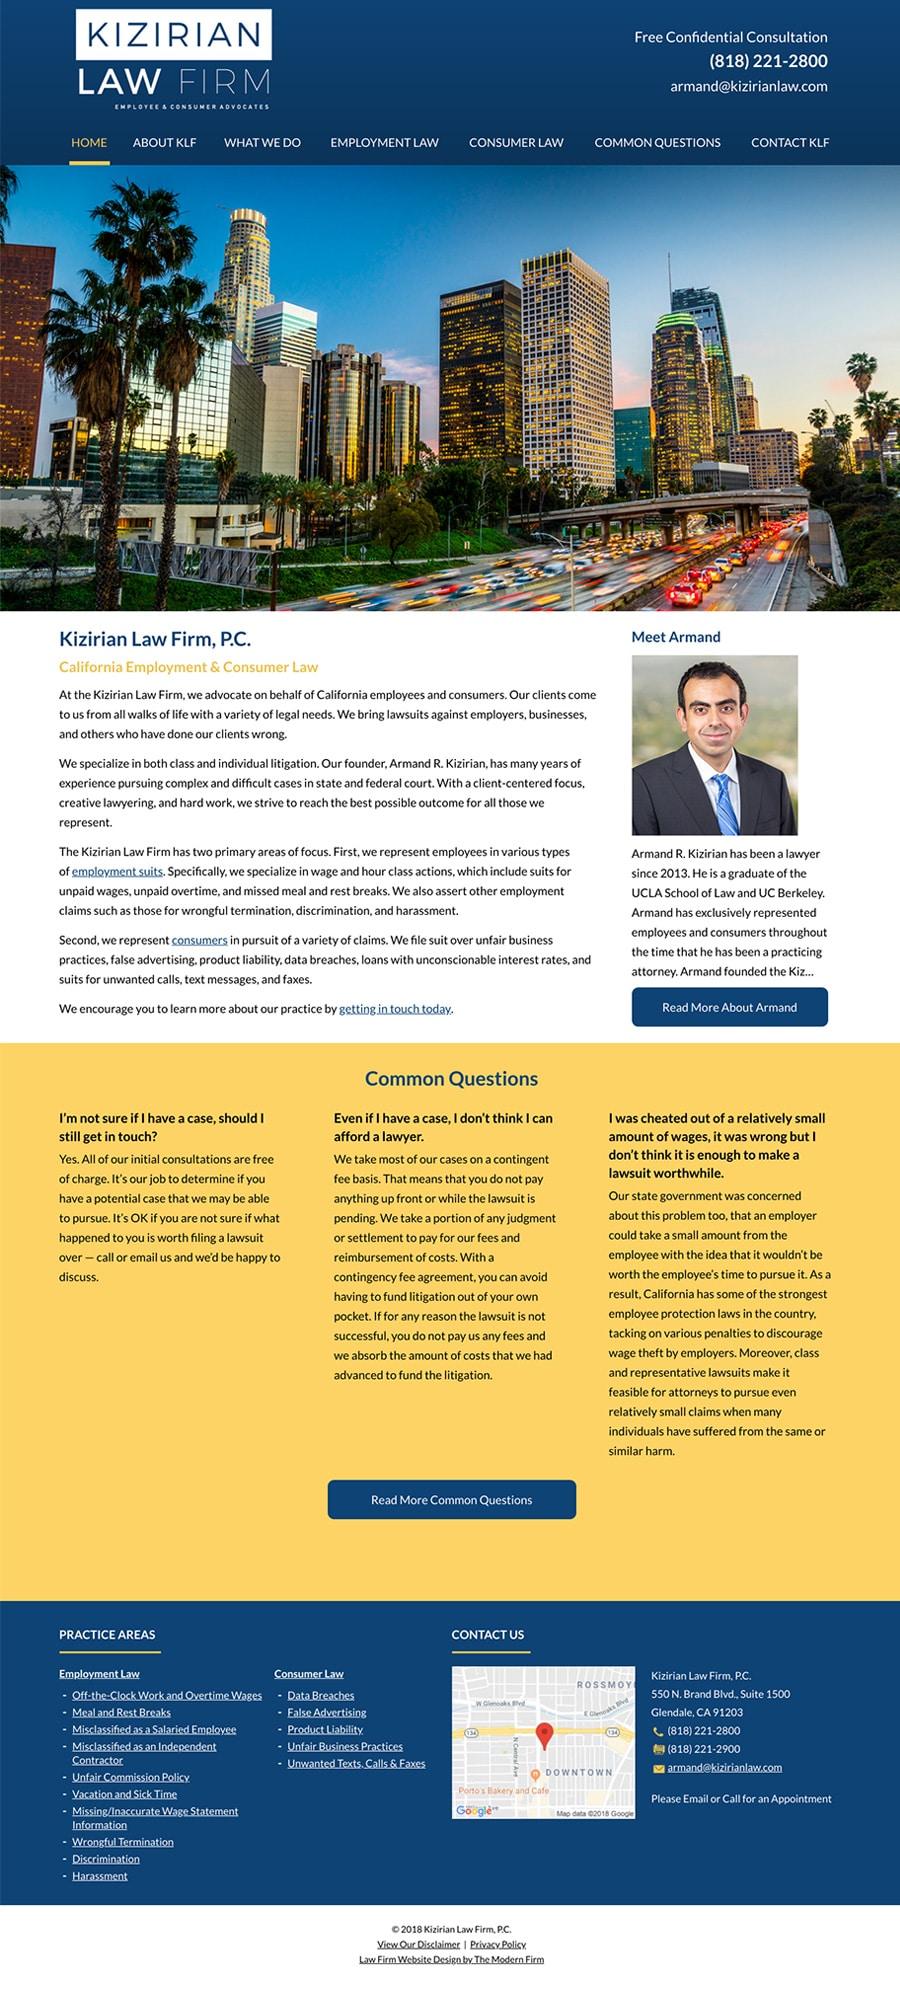 Law Firm Website Design for Kizirian Law Firm, P.C.